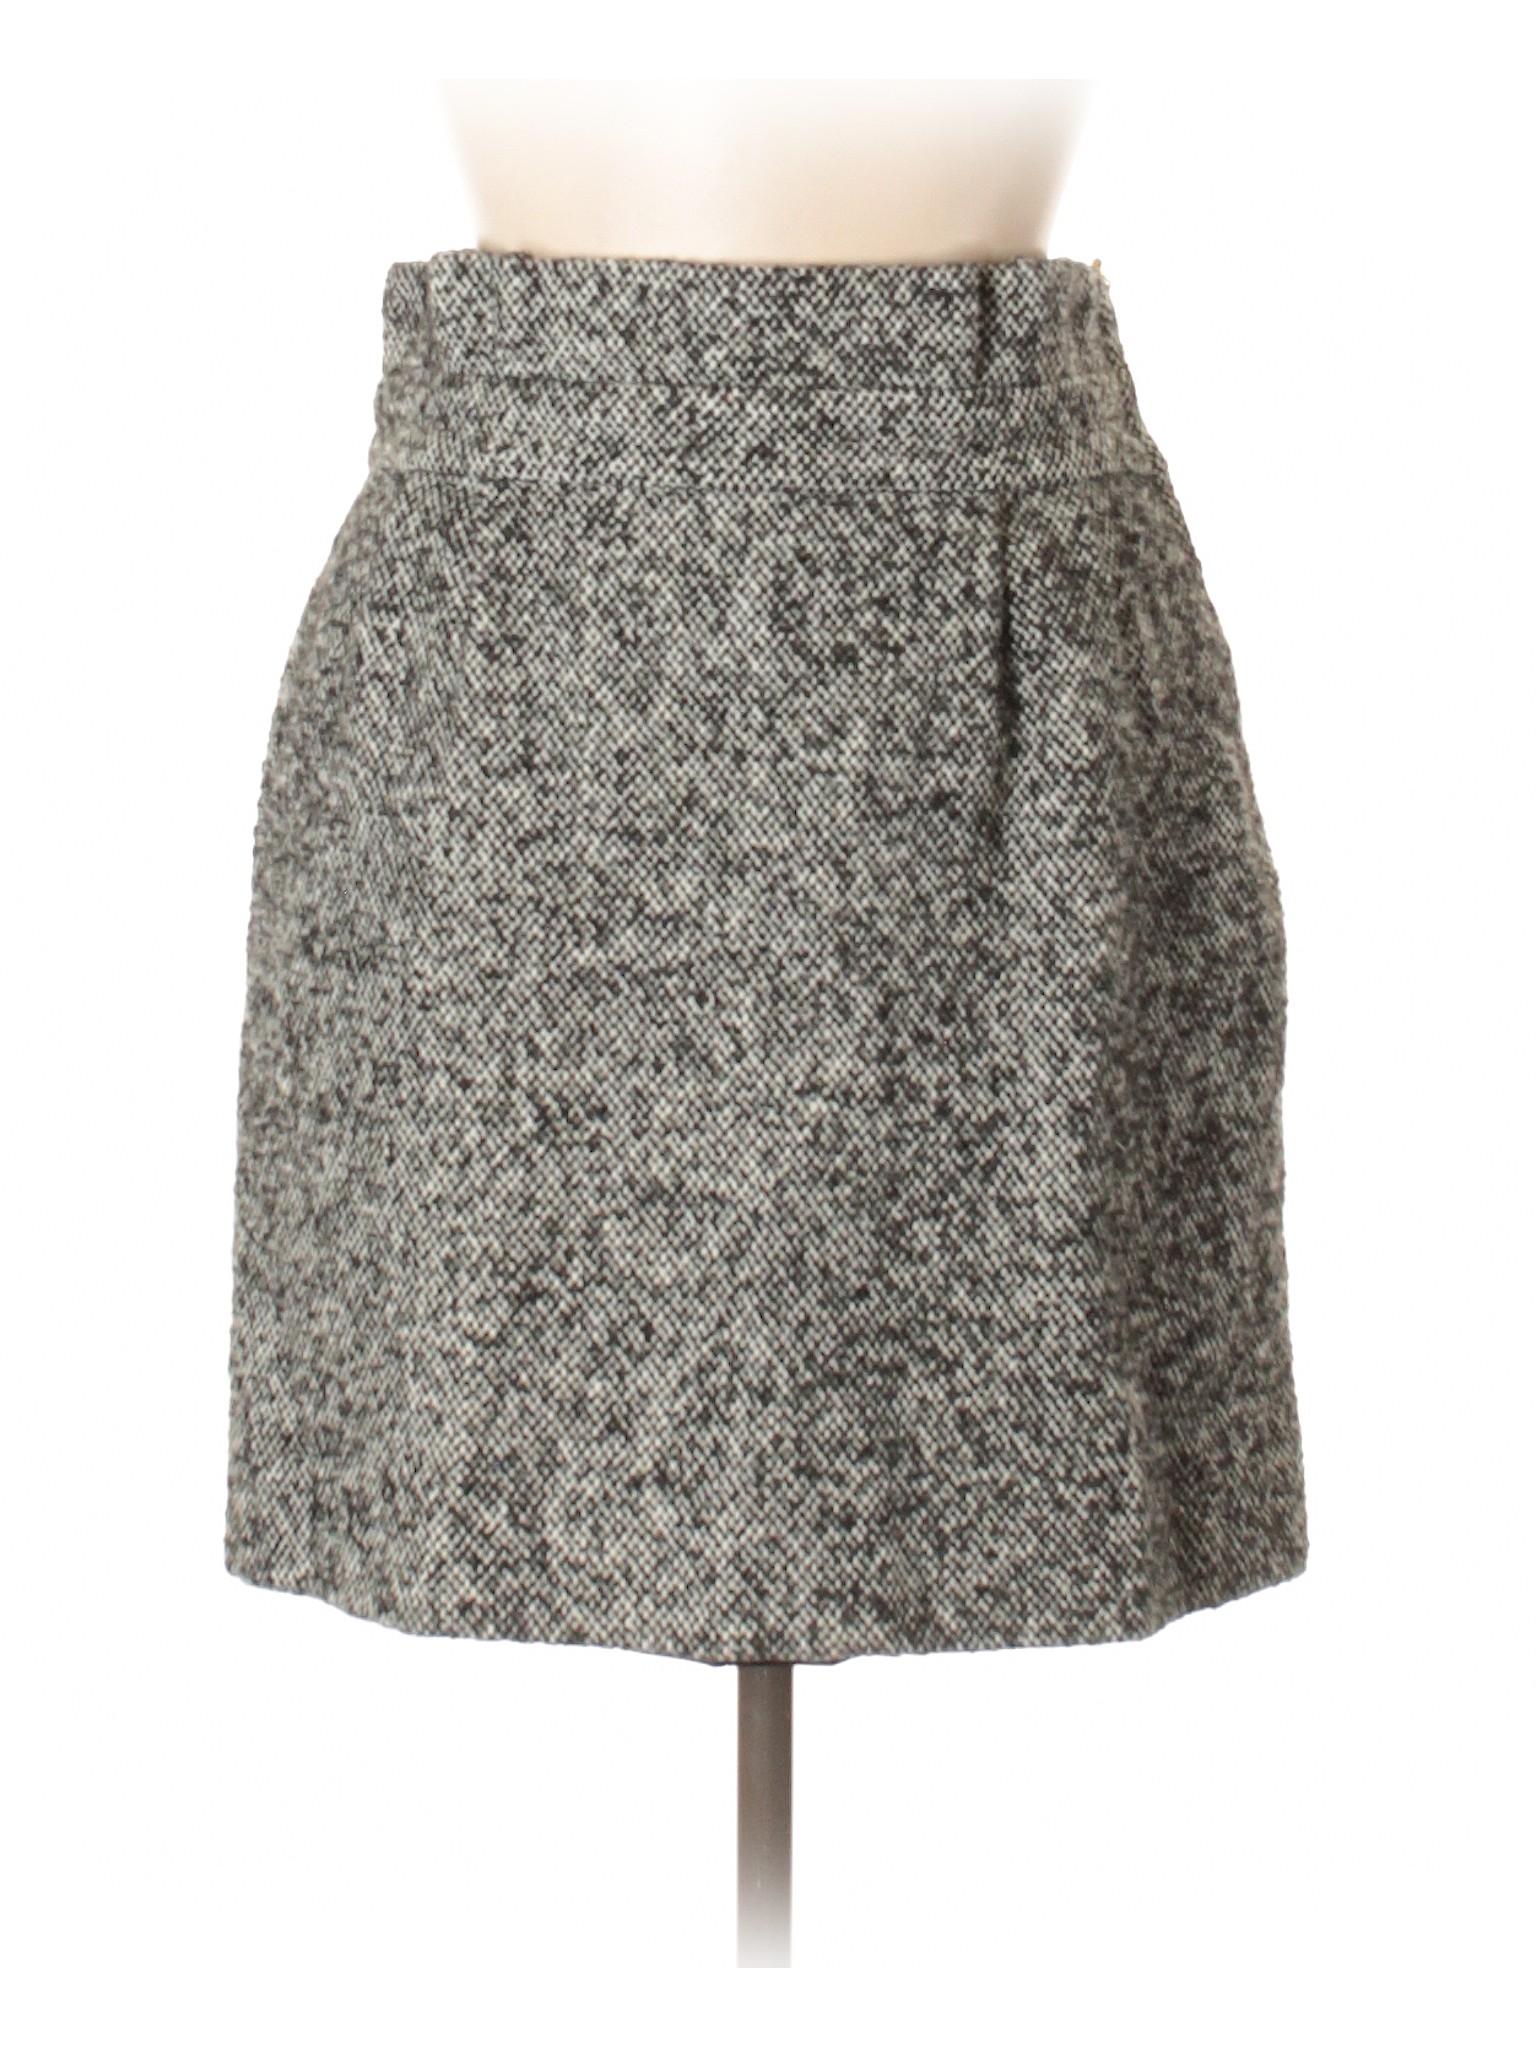 New Kate Skirt Spade winter Leisure York Casual FSqOnx7